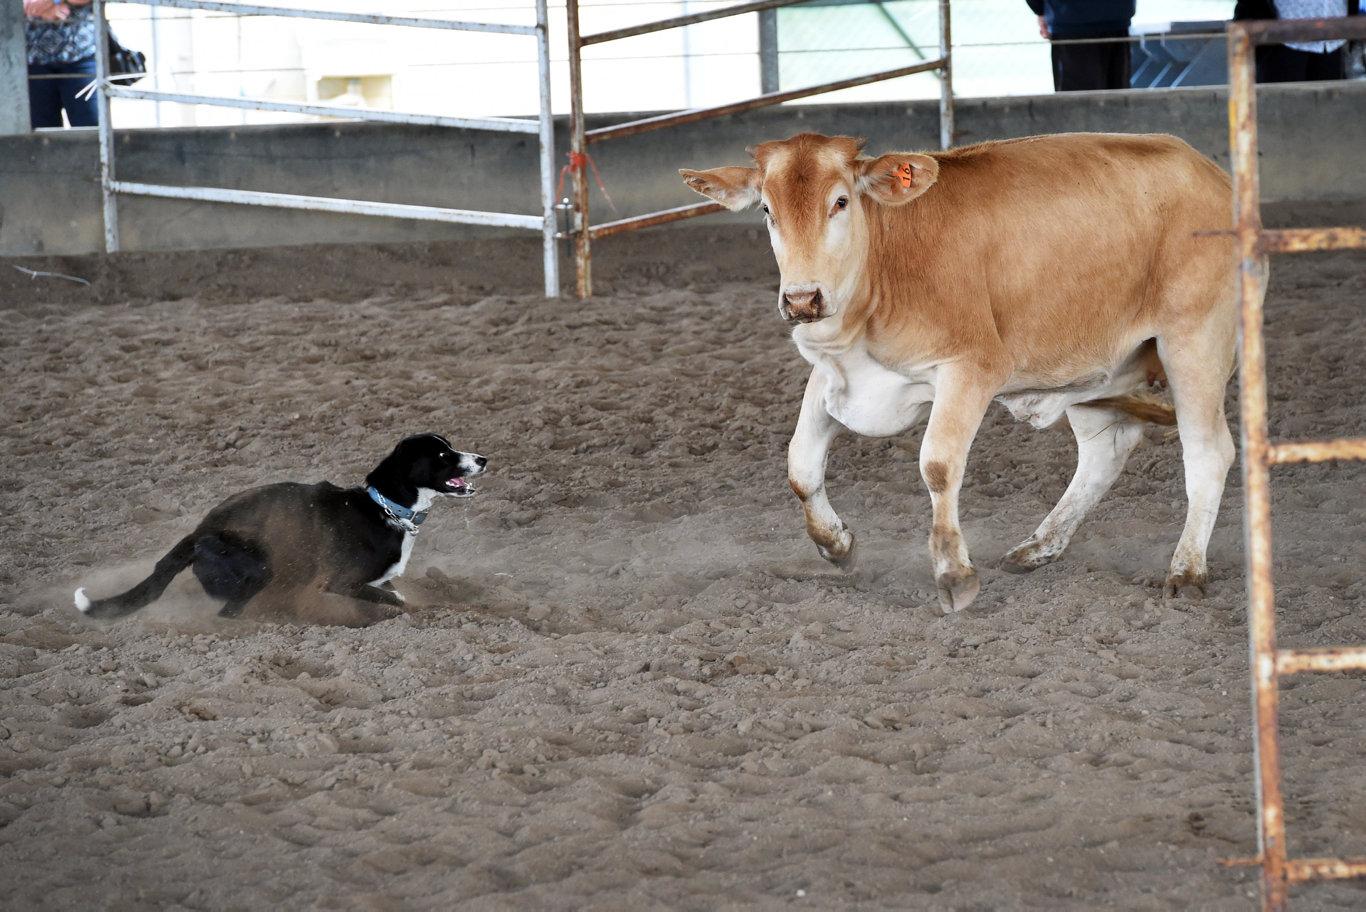 Fraser Coast Show - working dog trials - Ann Staatz with Nic the dog.